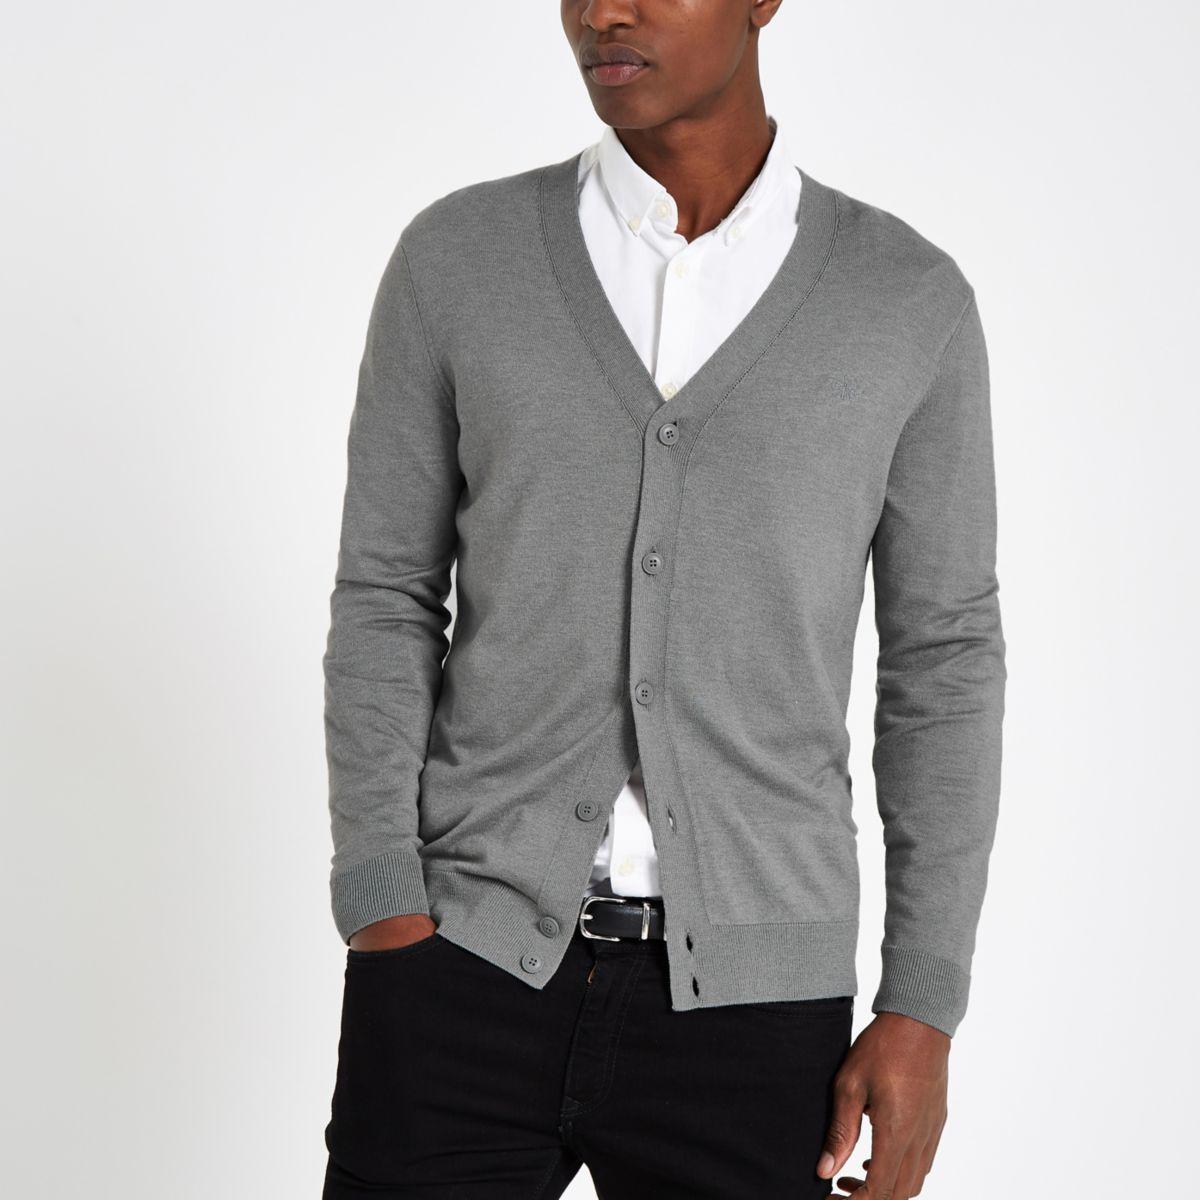 Grey V neck button-up cardigan